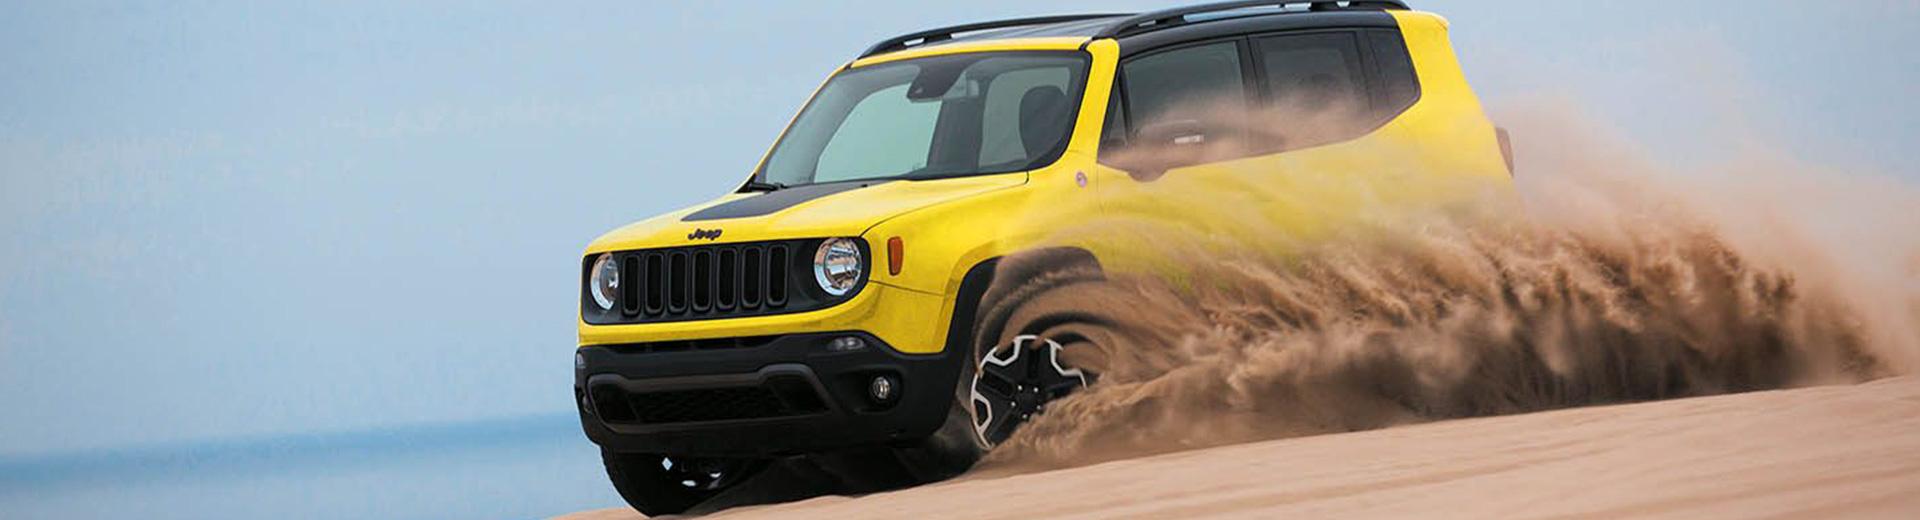 Jeep Renegade - Sand Dunes